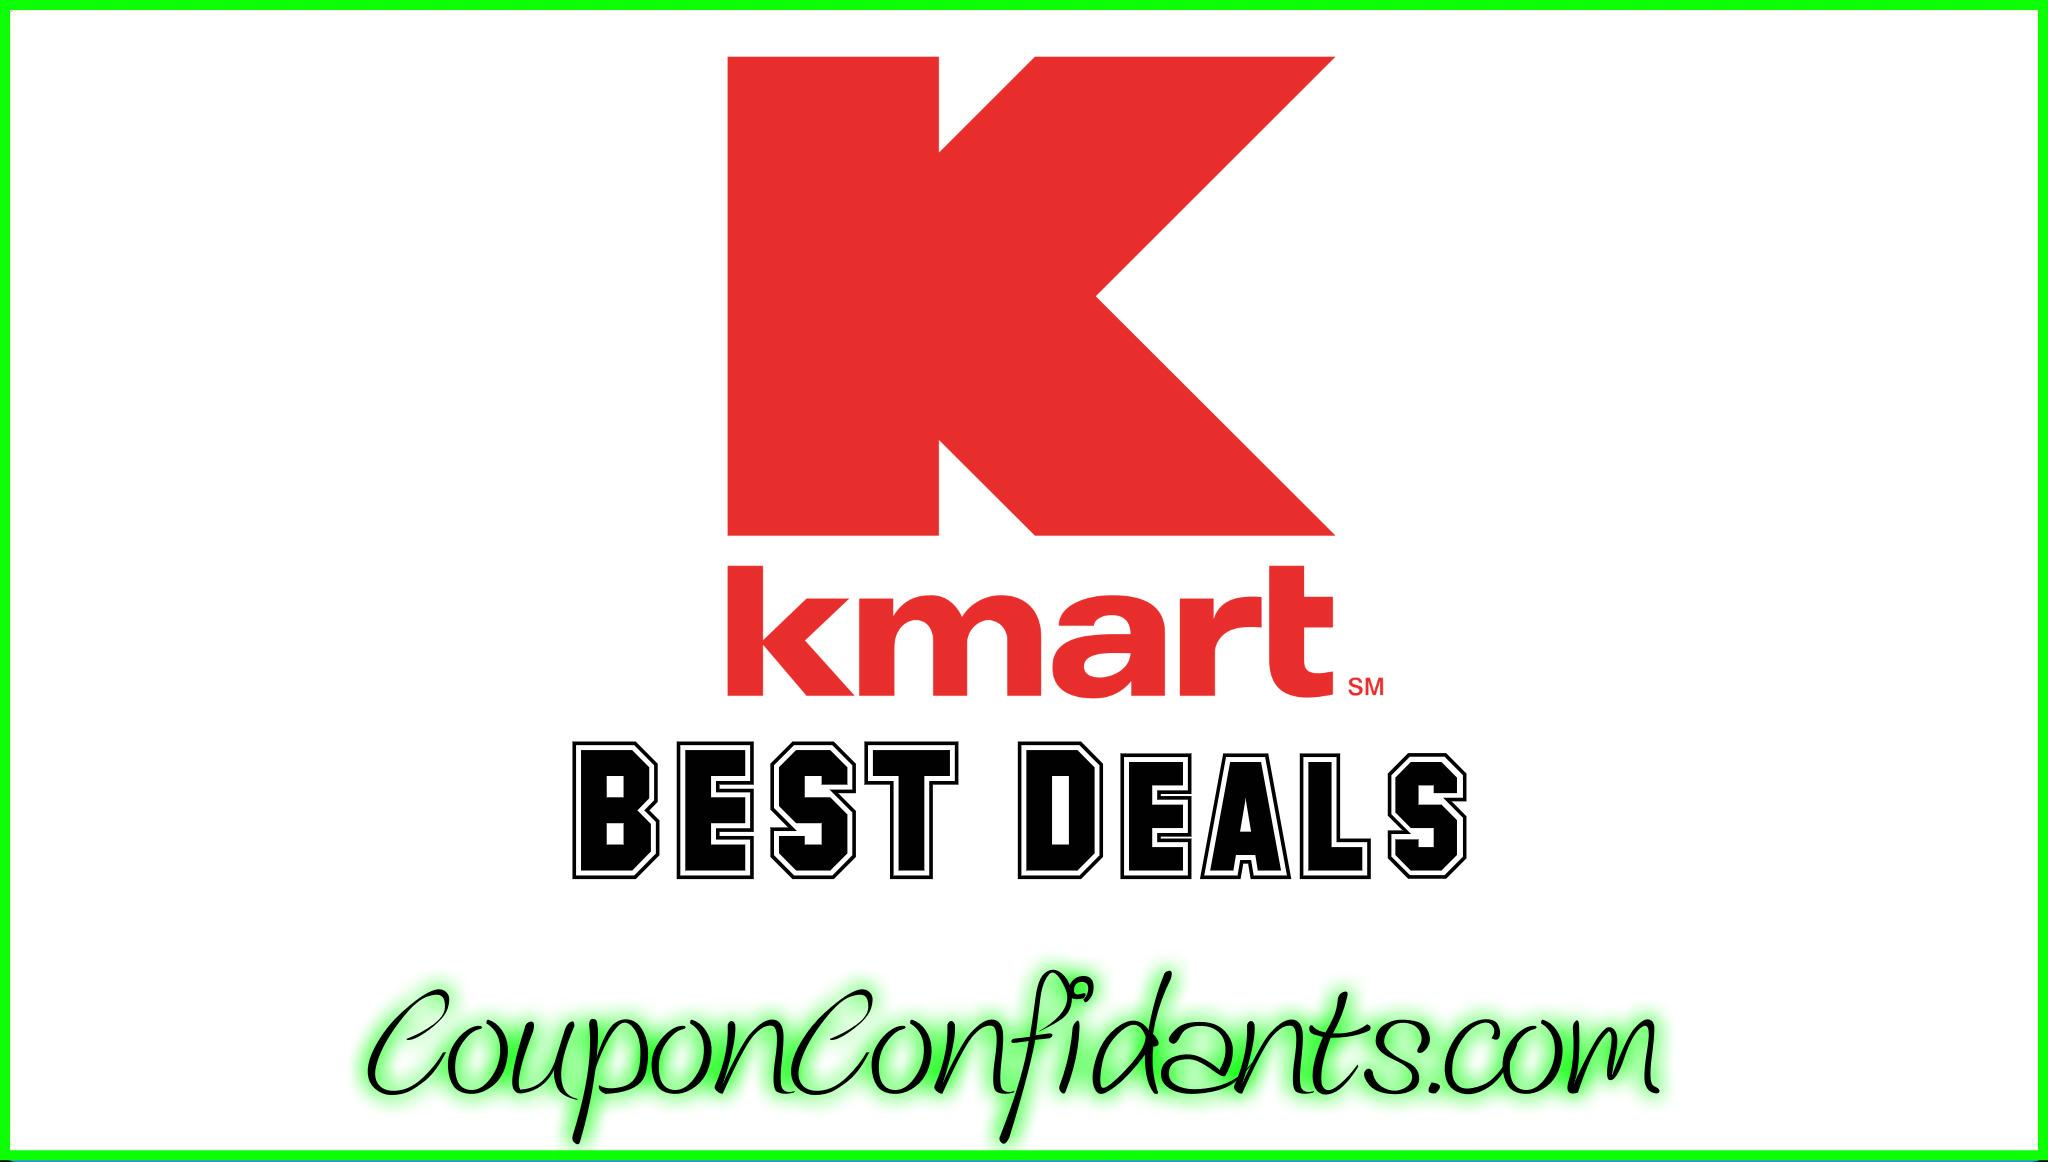 Kmart - Mar 26 - Apr 1